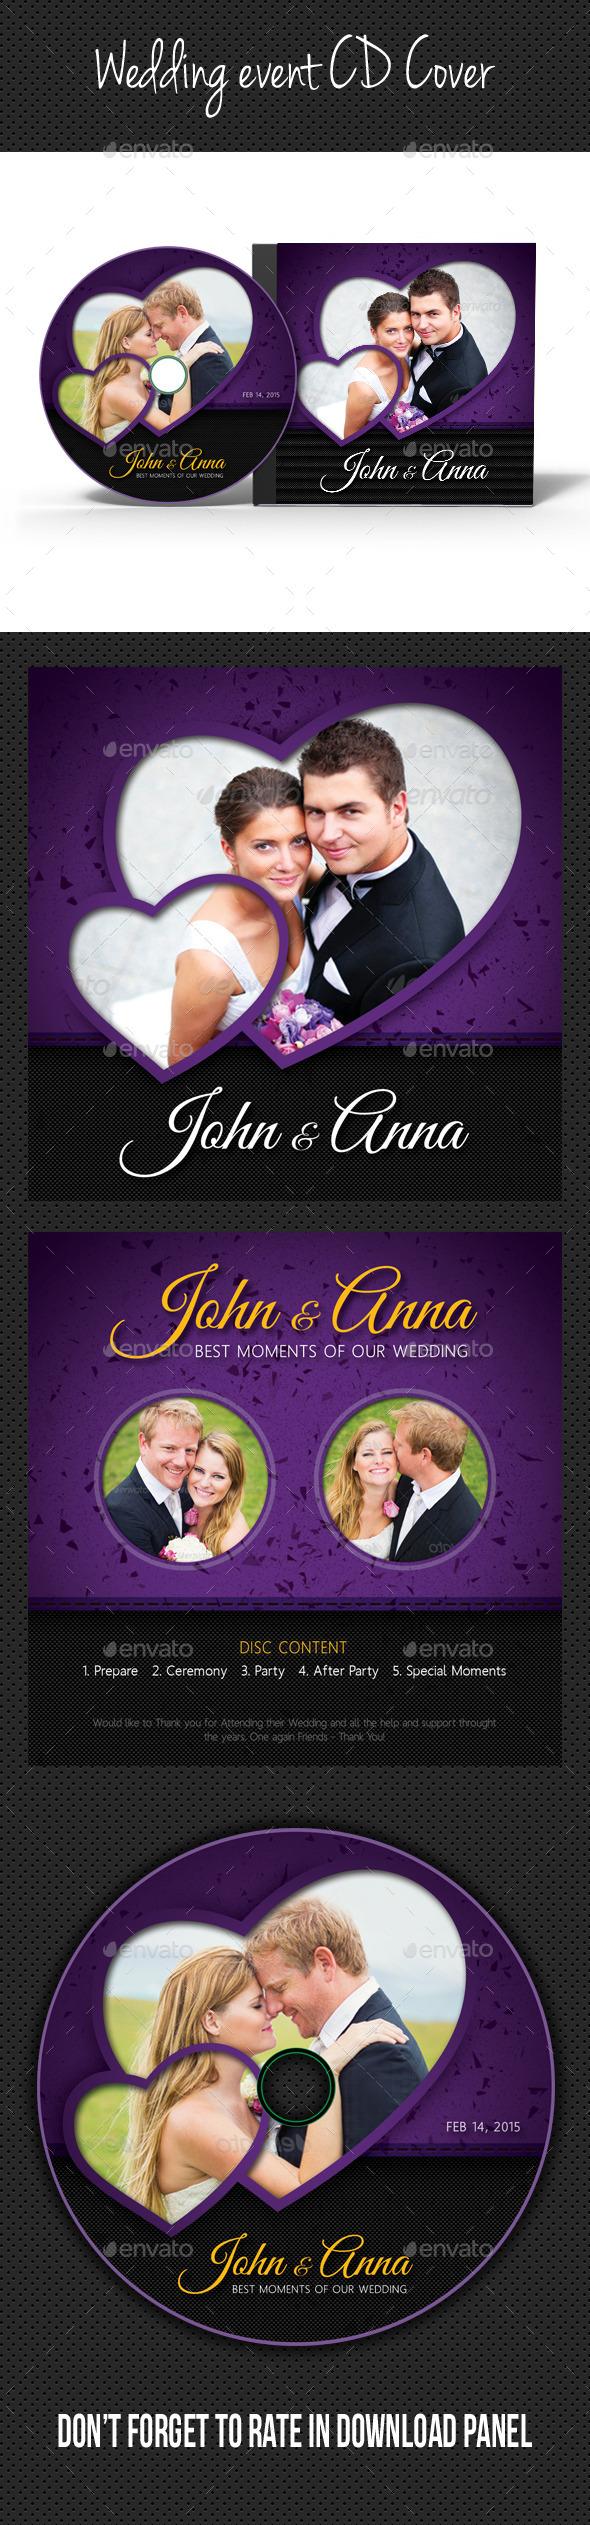 Wedding Event CD Cover V07 - CD & DVD Artwork Print Templates